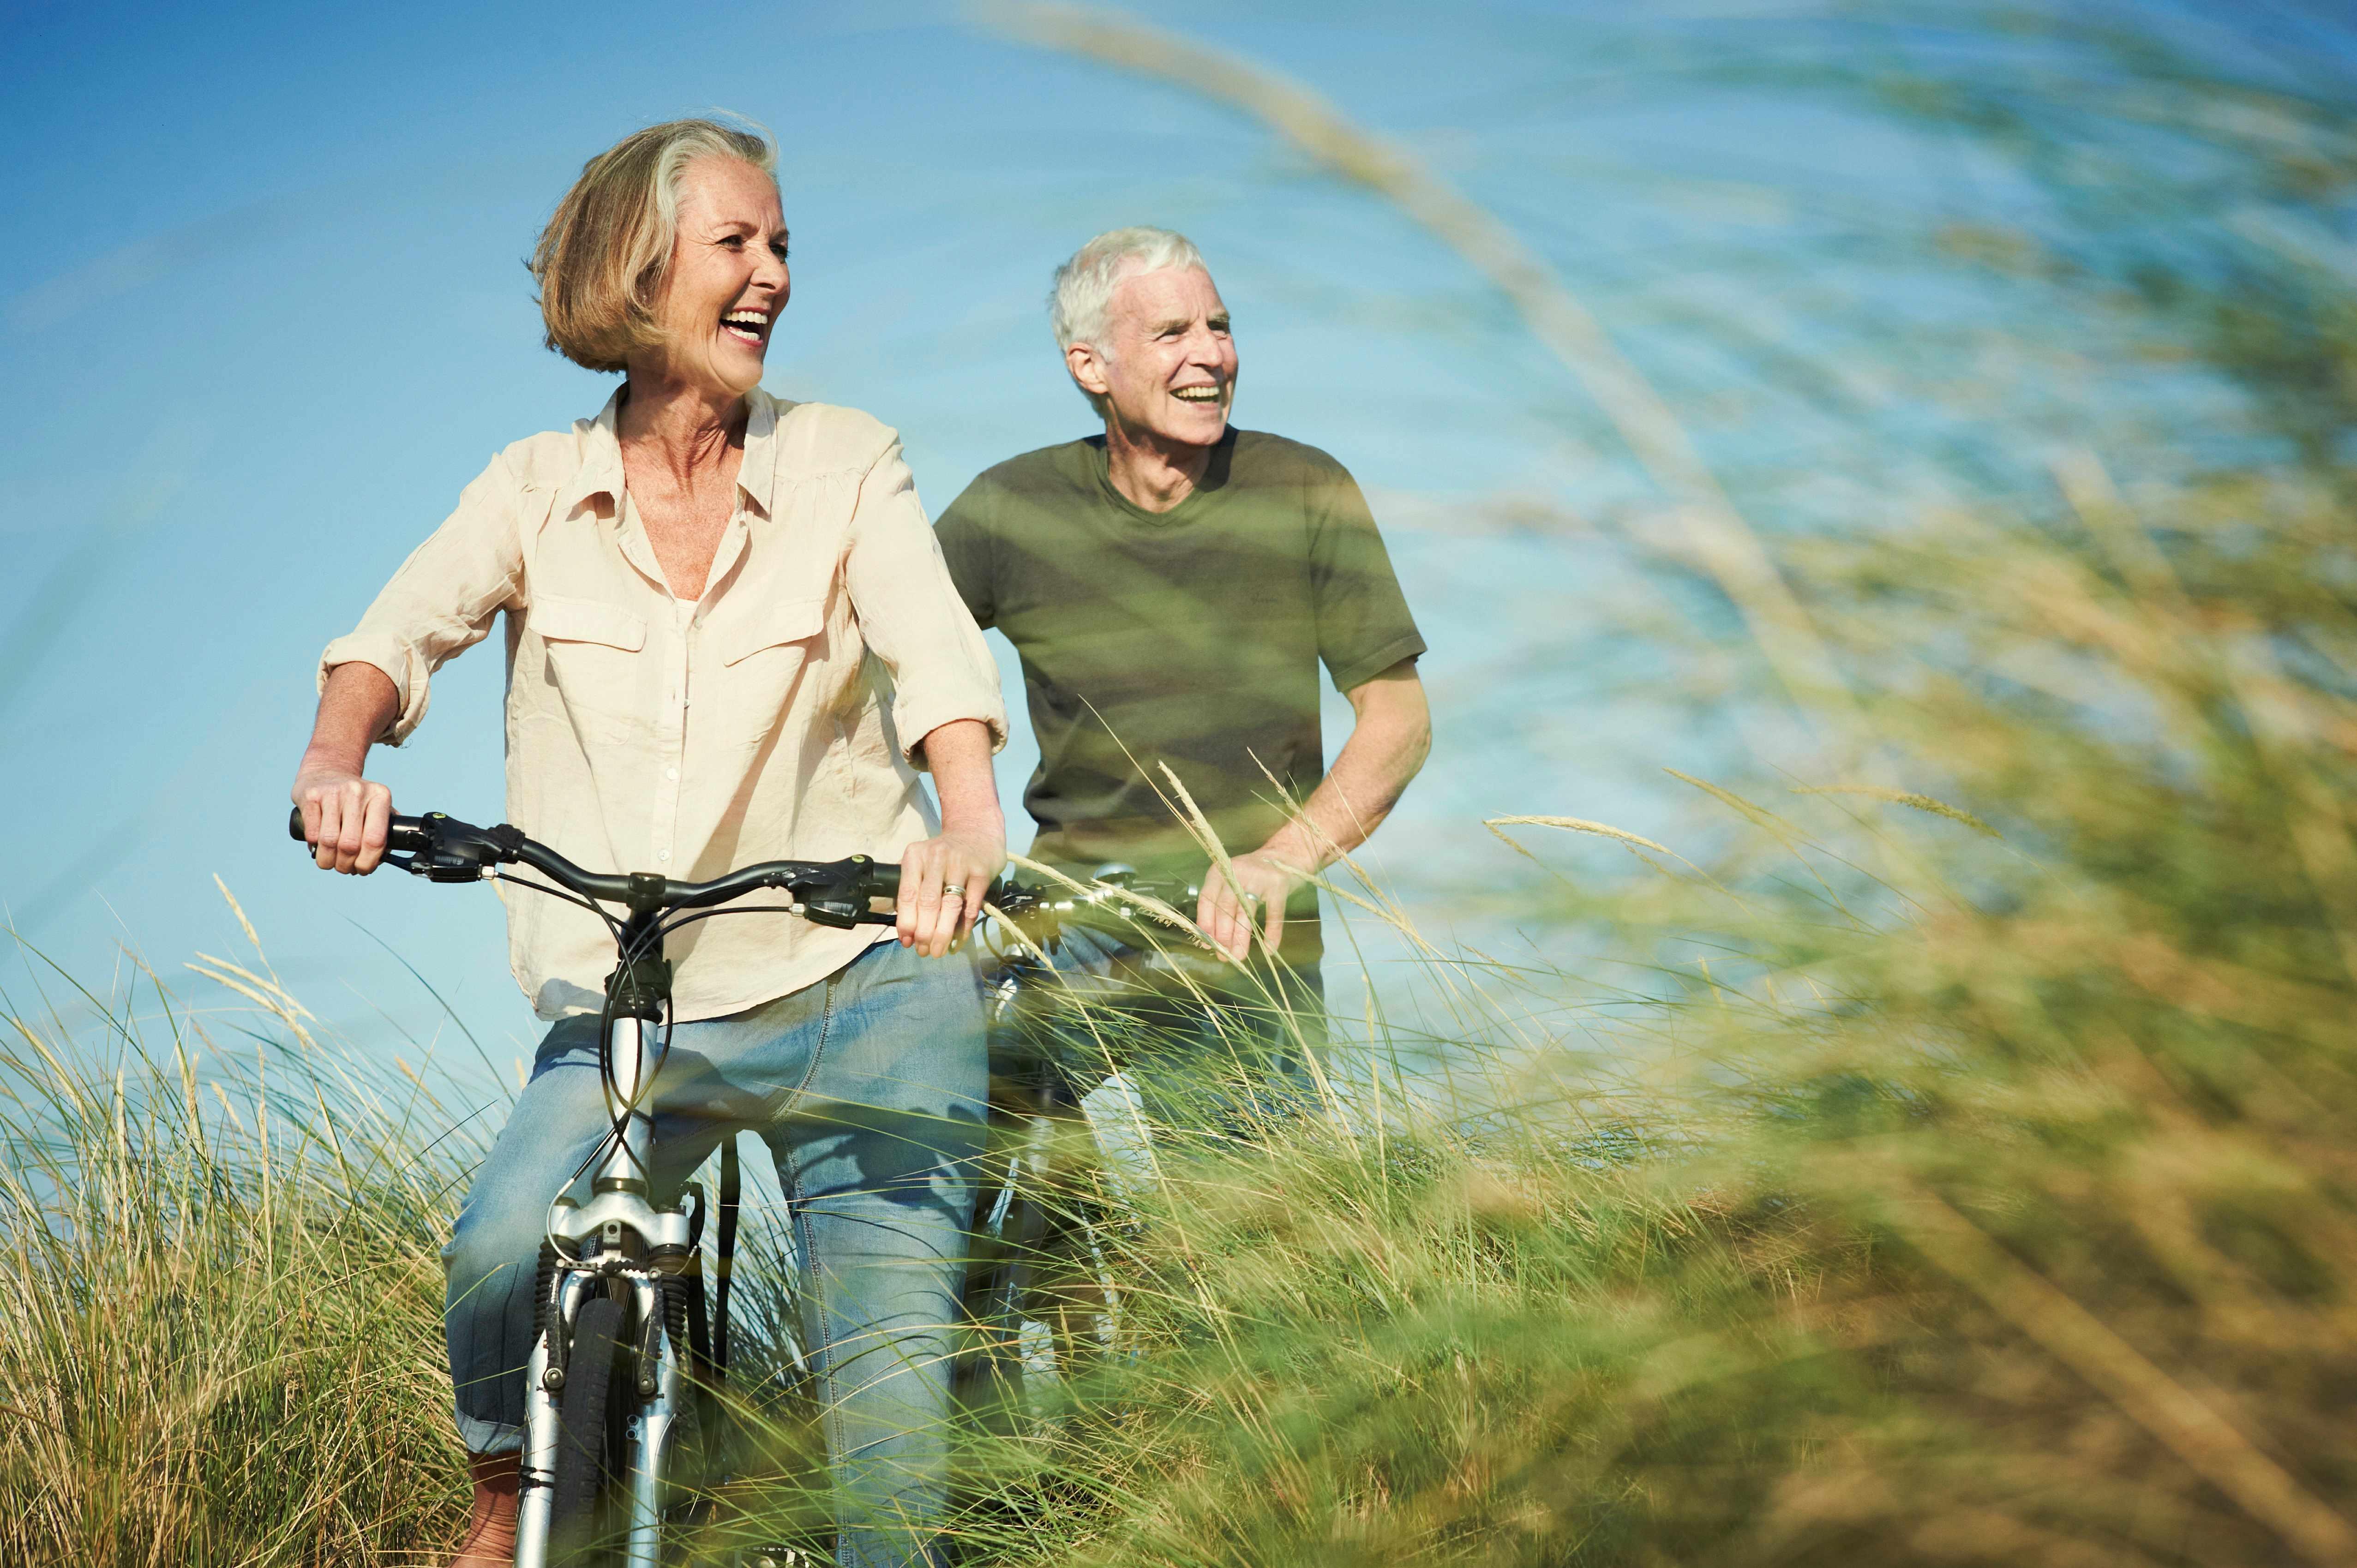 Senior couple enjoying day out on their bicycles